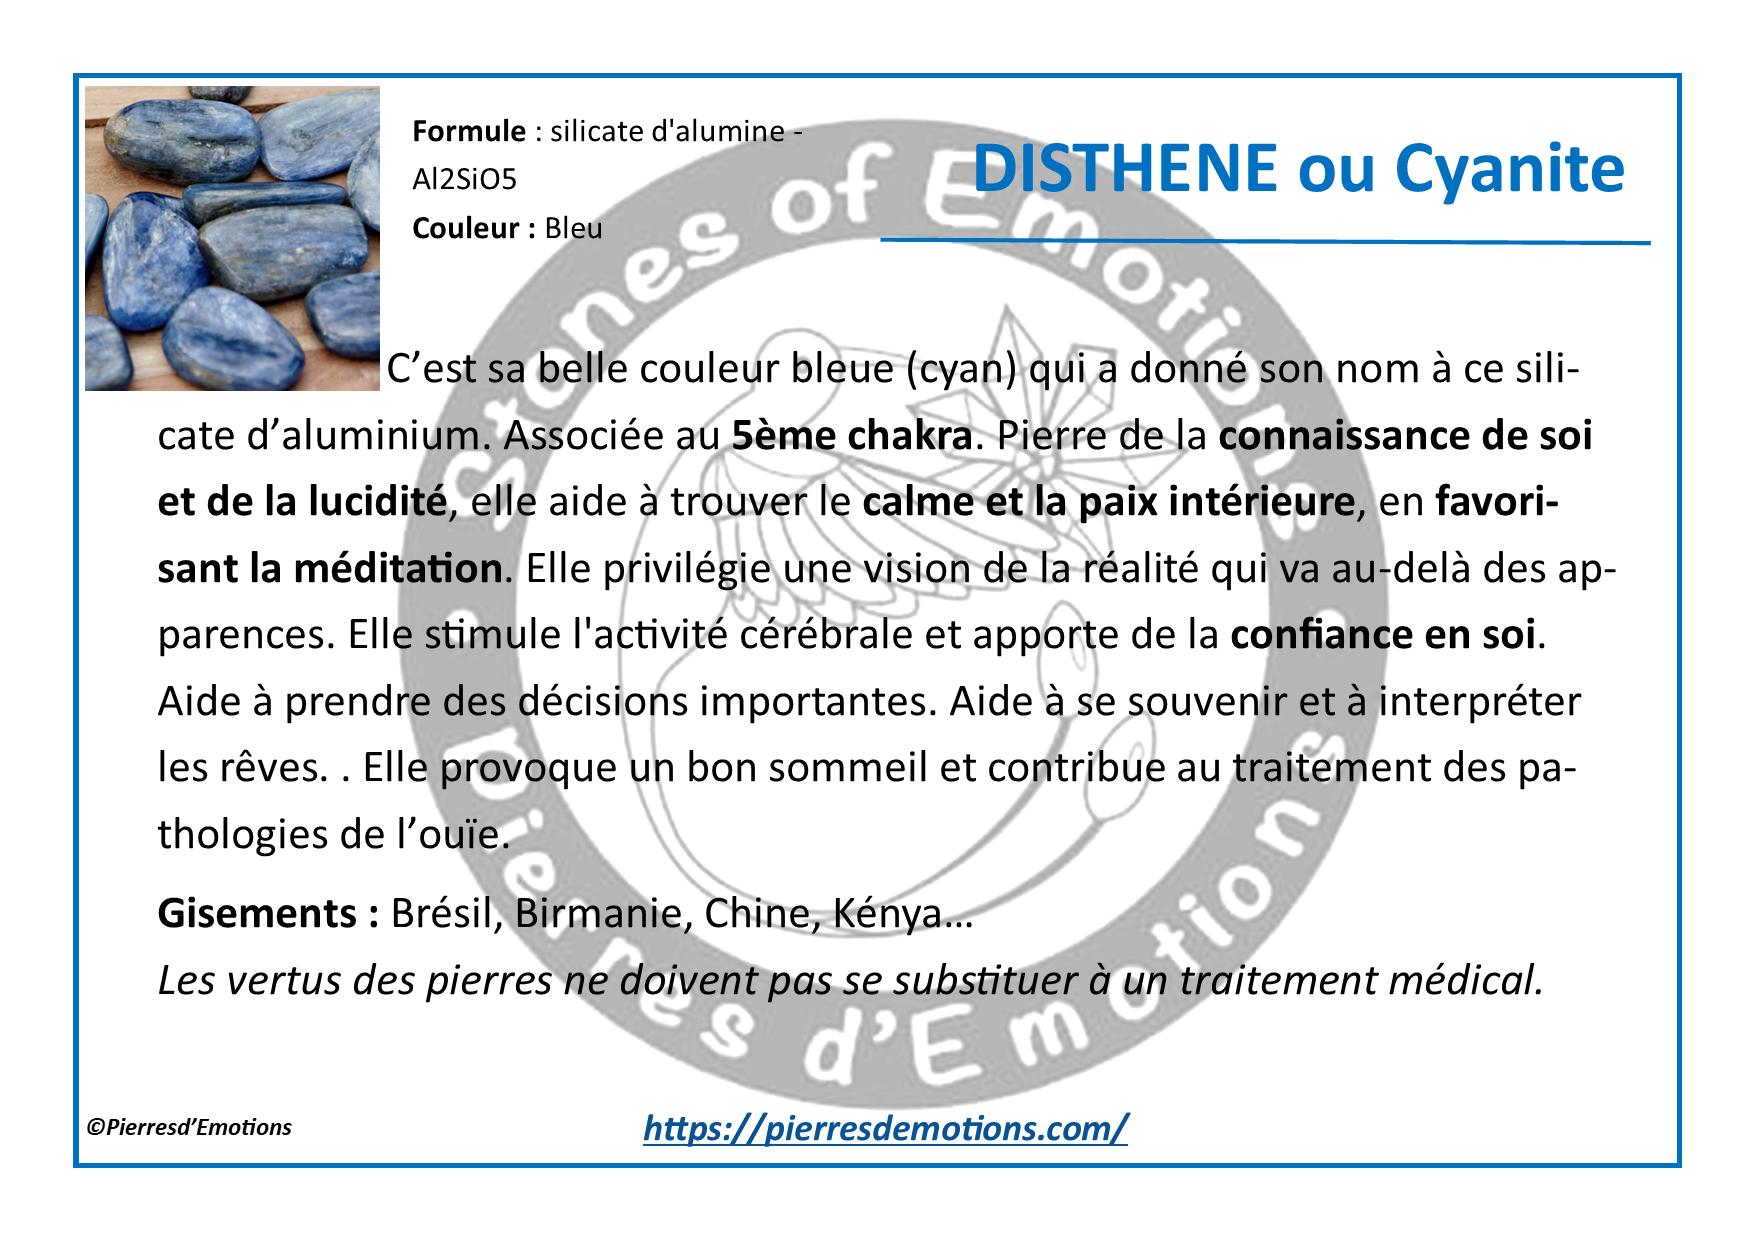 Cyanite-Disthene